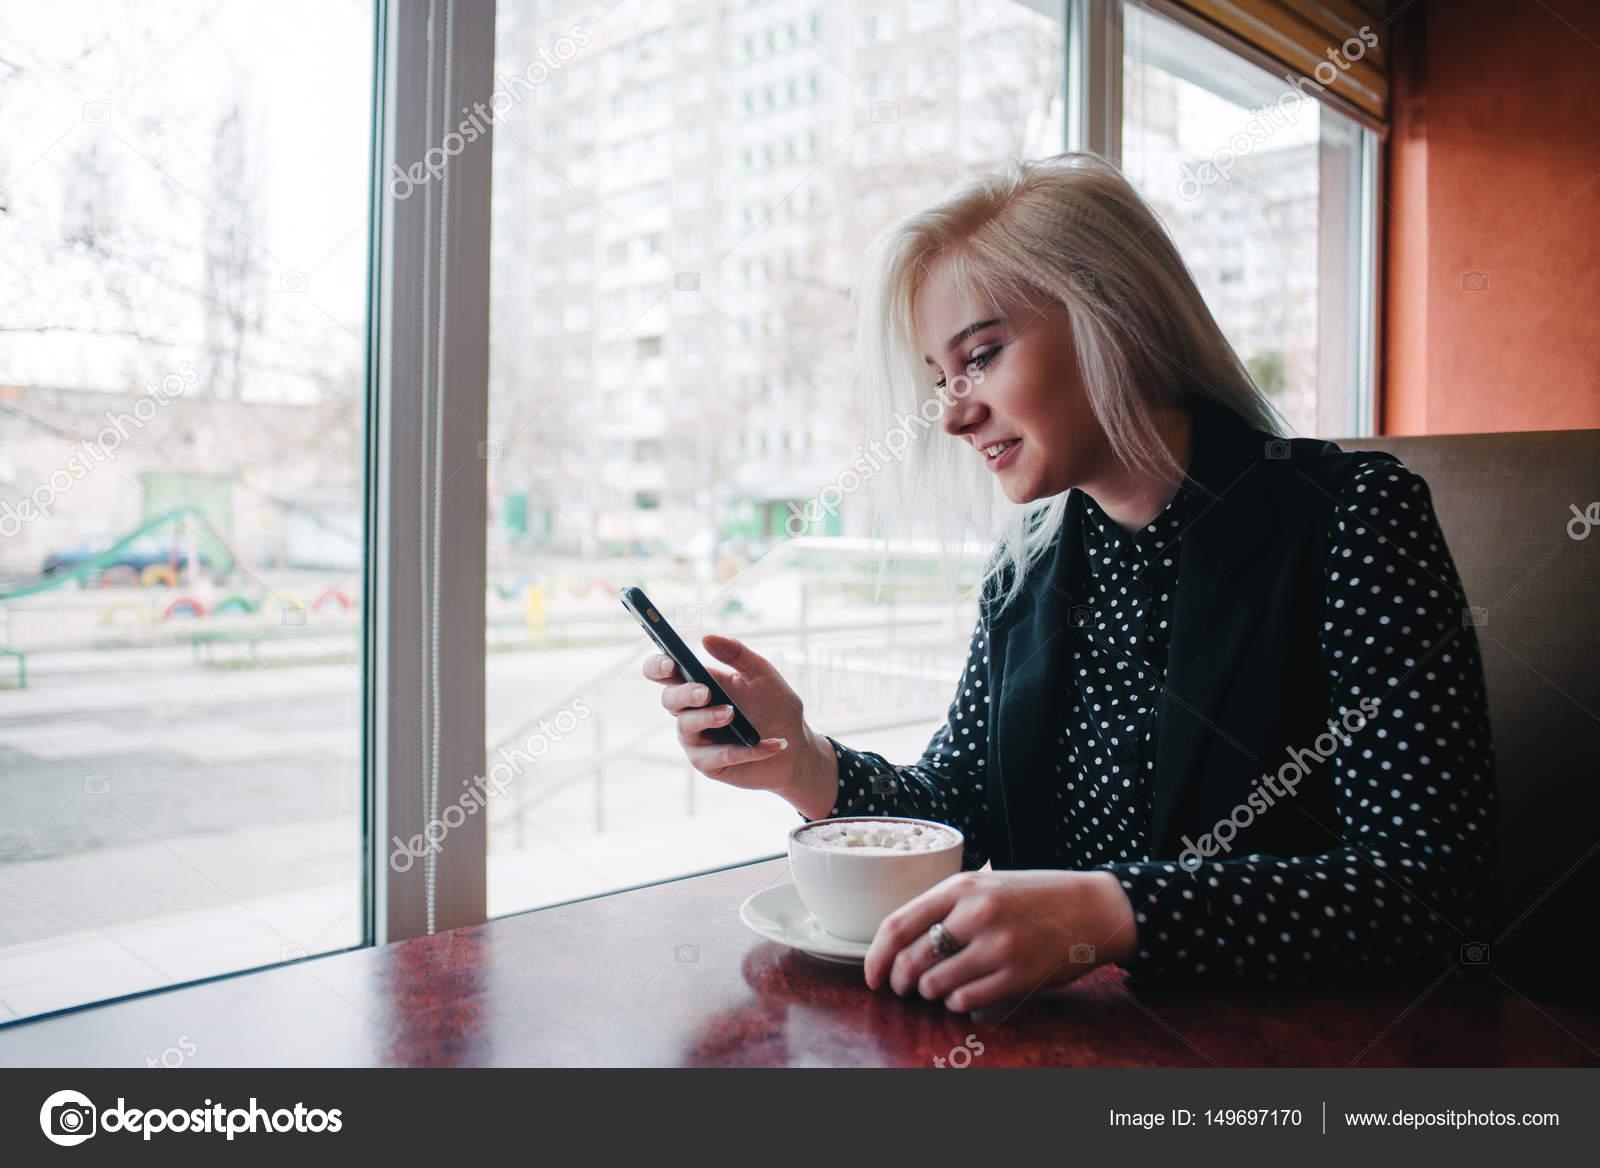 Скачать на телефон фото молодой девушки фото 295-151